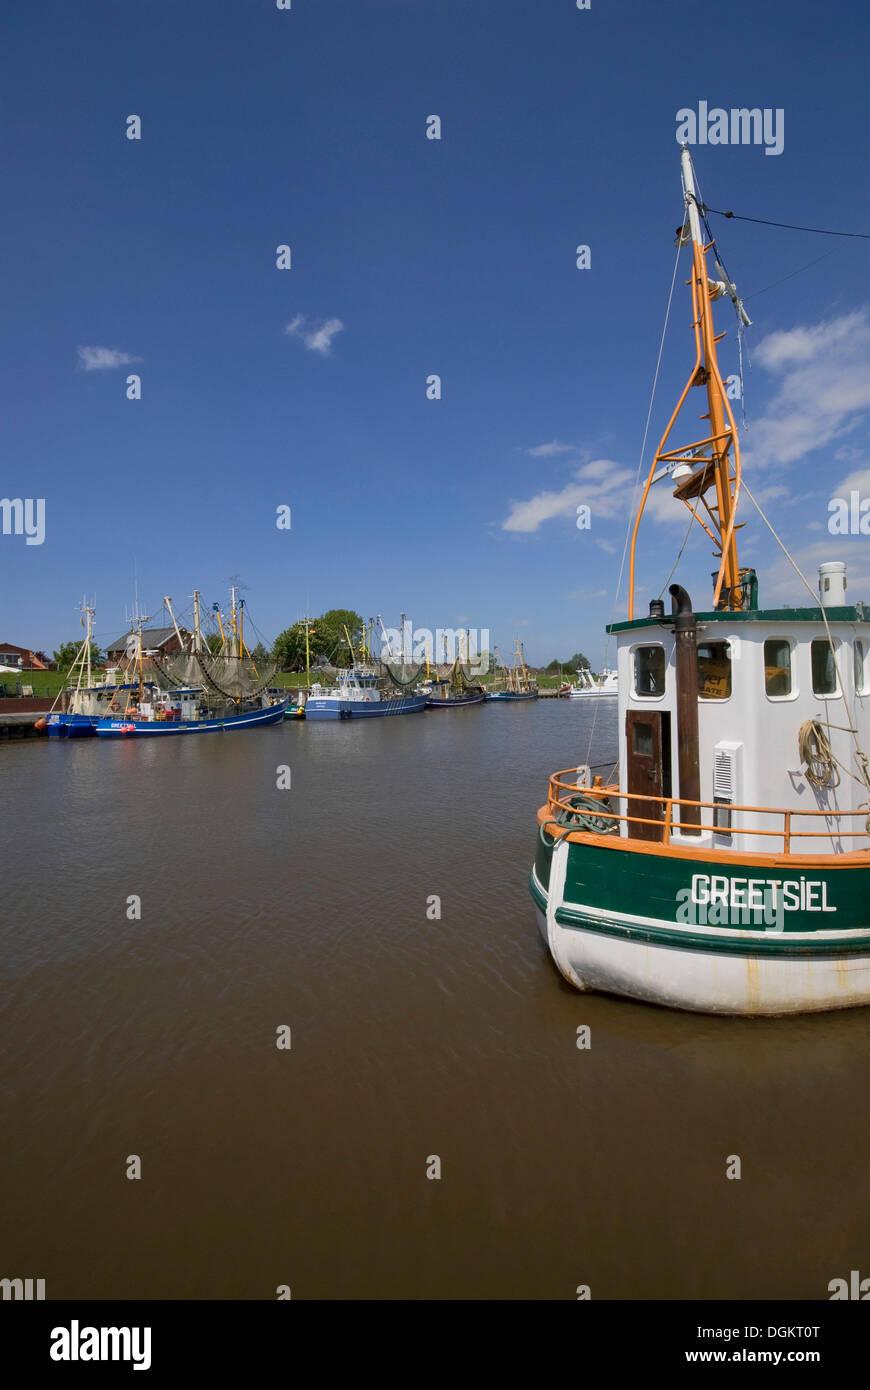 Avis de Greetsiel port avec bateaux, crabe Krummhoern, Frise orientale, Basse-Saxe Photo Stock